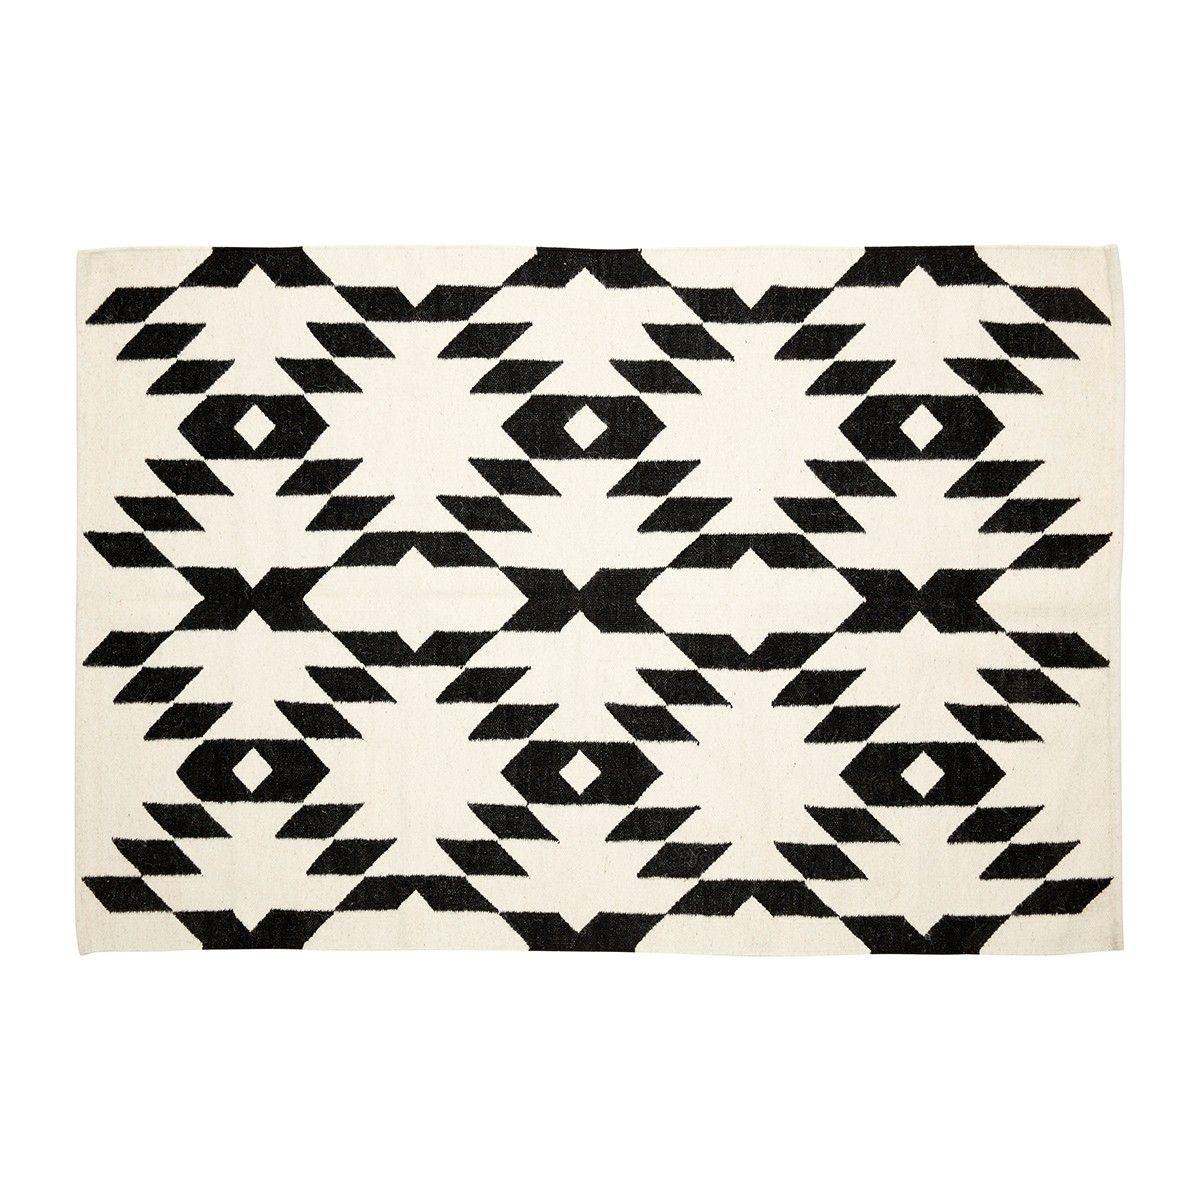 top tapis graphique noir et blanc hbsch hubsch with tapis. Black Bedroom Furniture Sets. Home Design Ideas